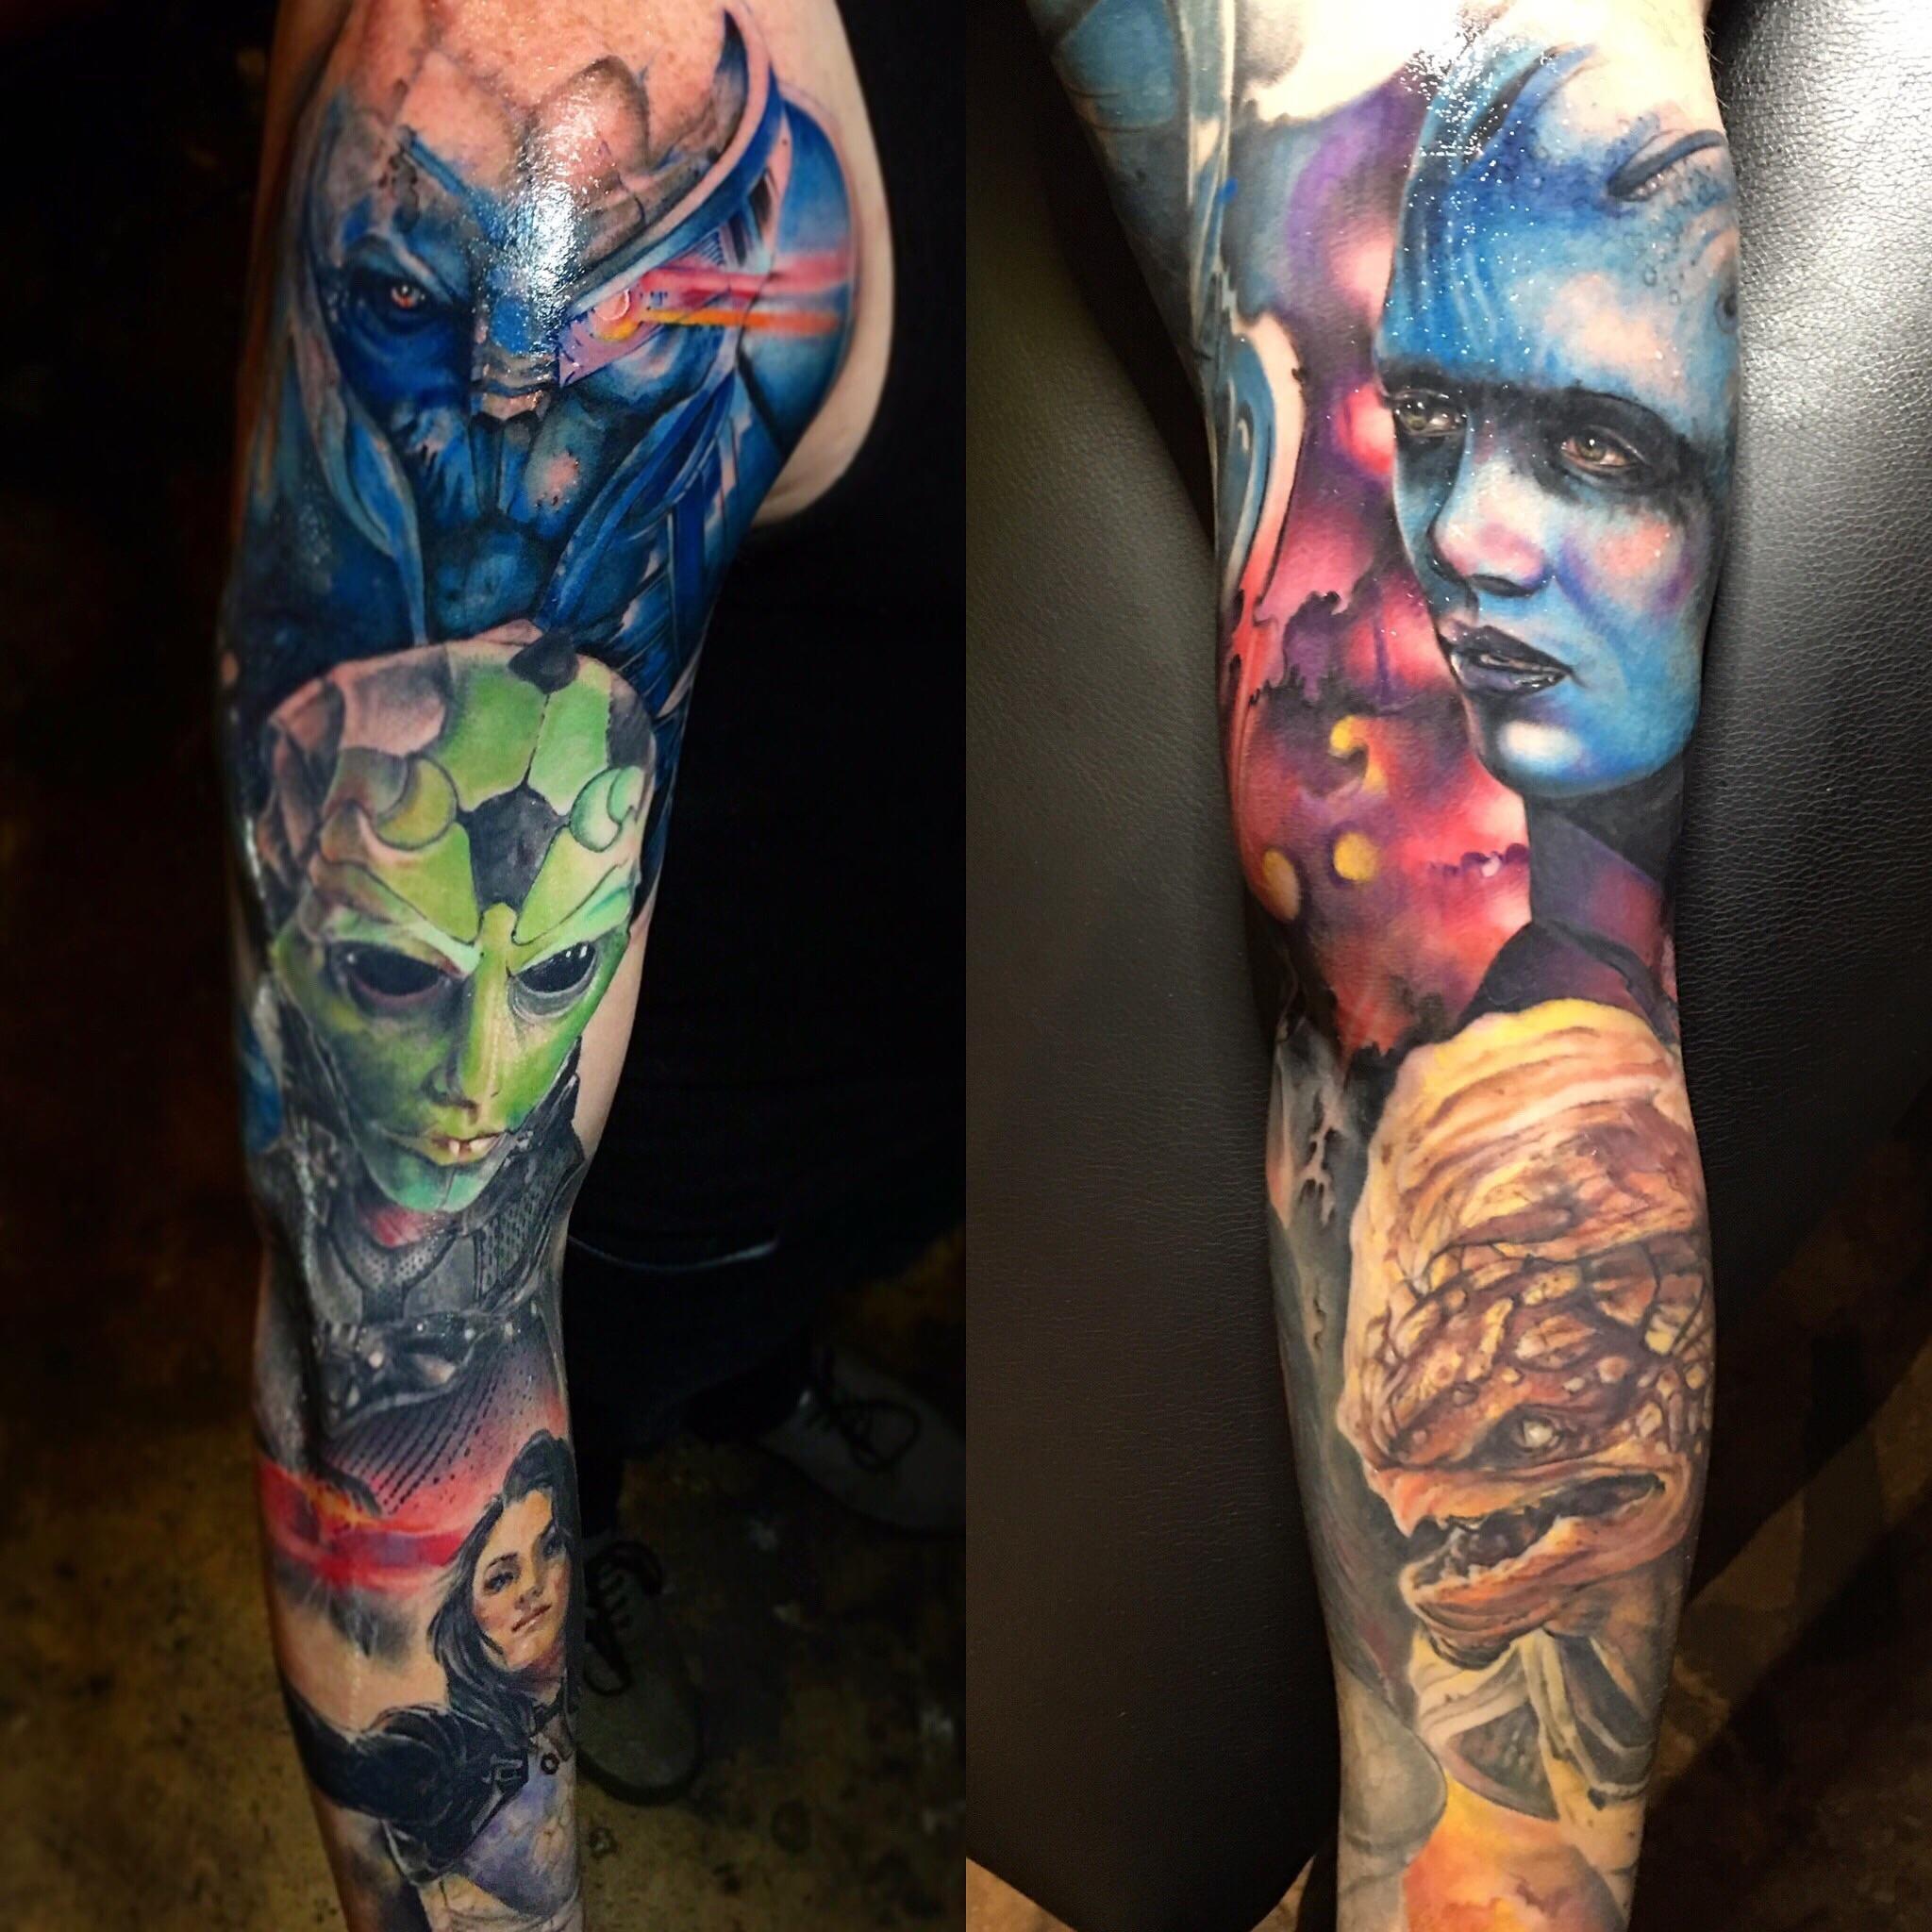 Mass Effect Sleeve By Jeff Hubbard At Revolution Ink In Pelham Alabama Mass Effect Tattoo Japanese Tattoo Japanese Tattoos For Men